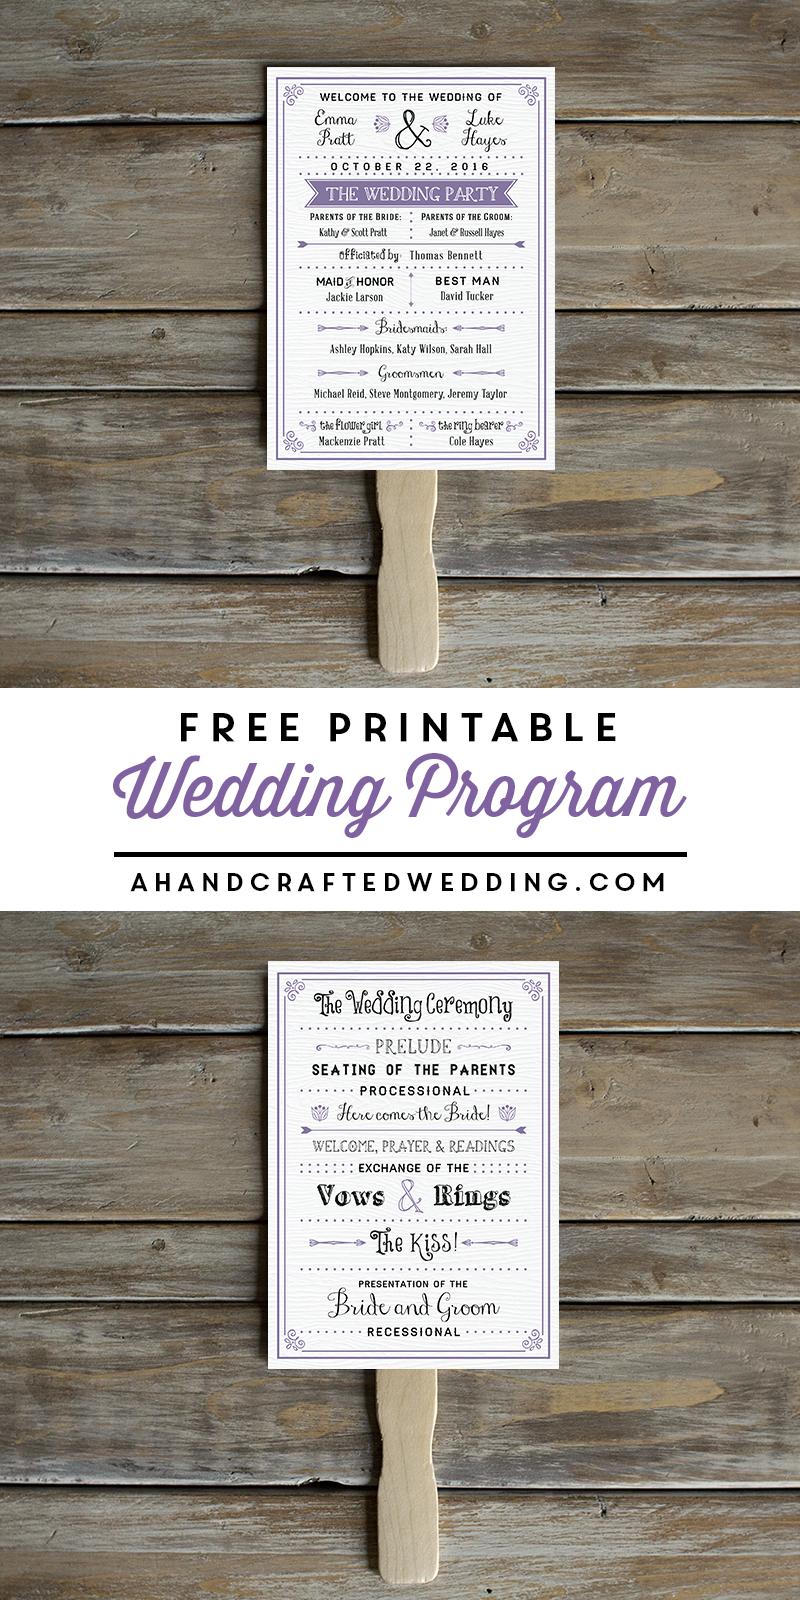 Free printable wedding program jackies wedding pinterest